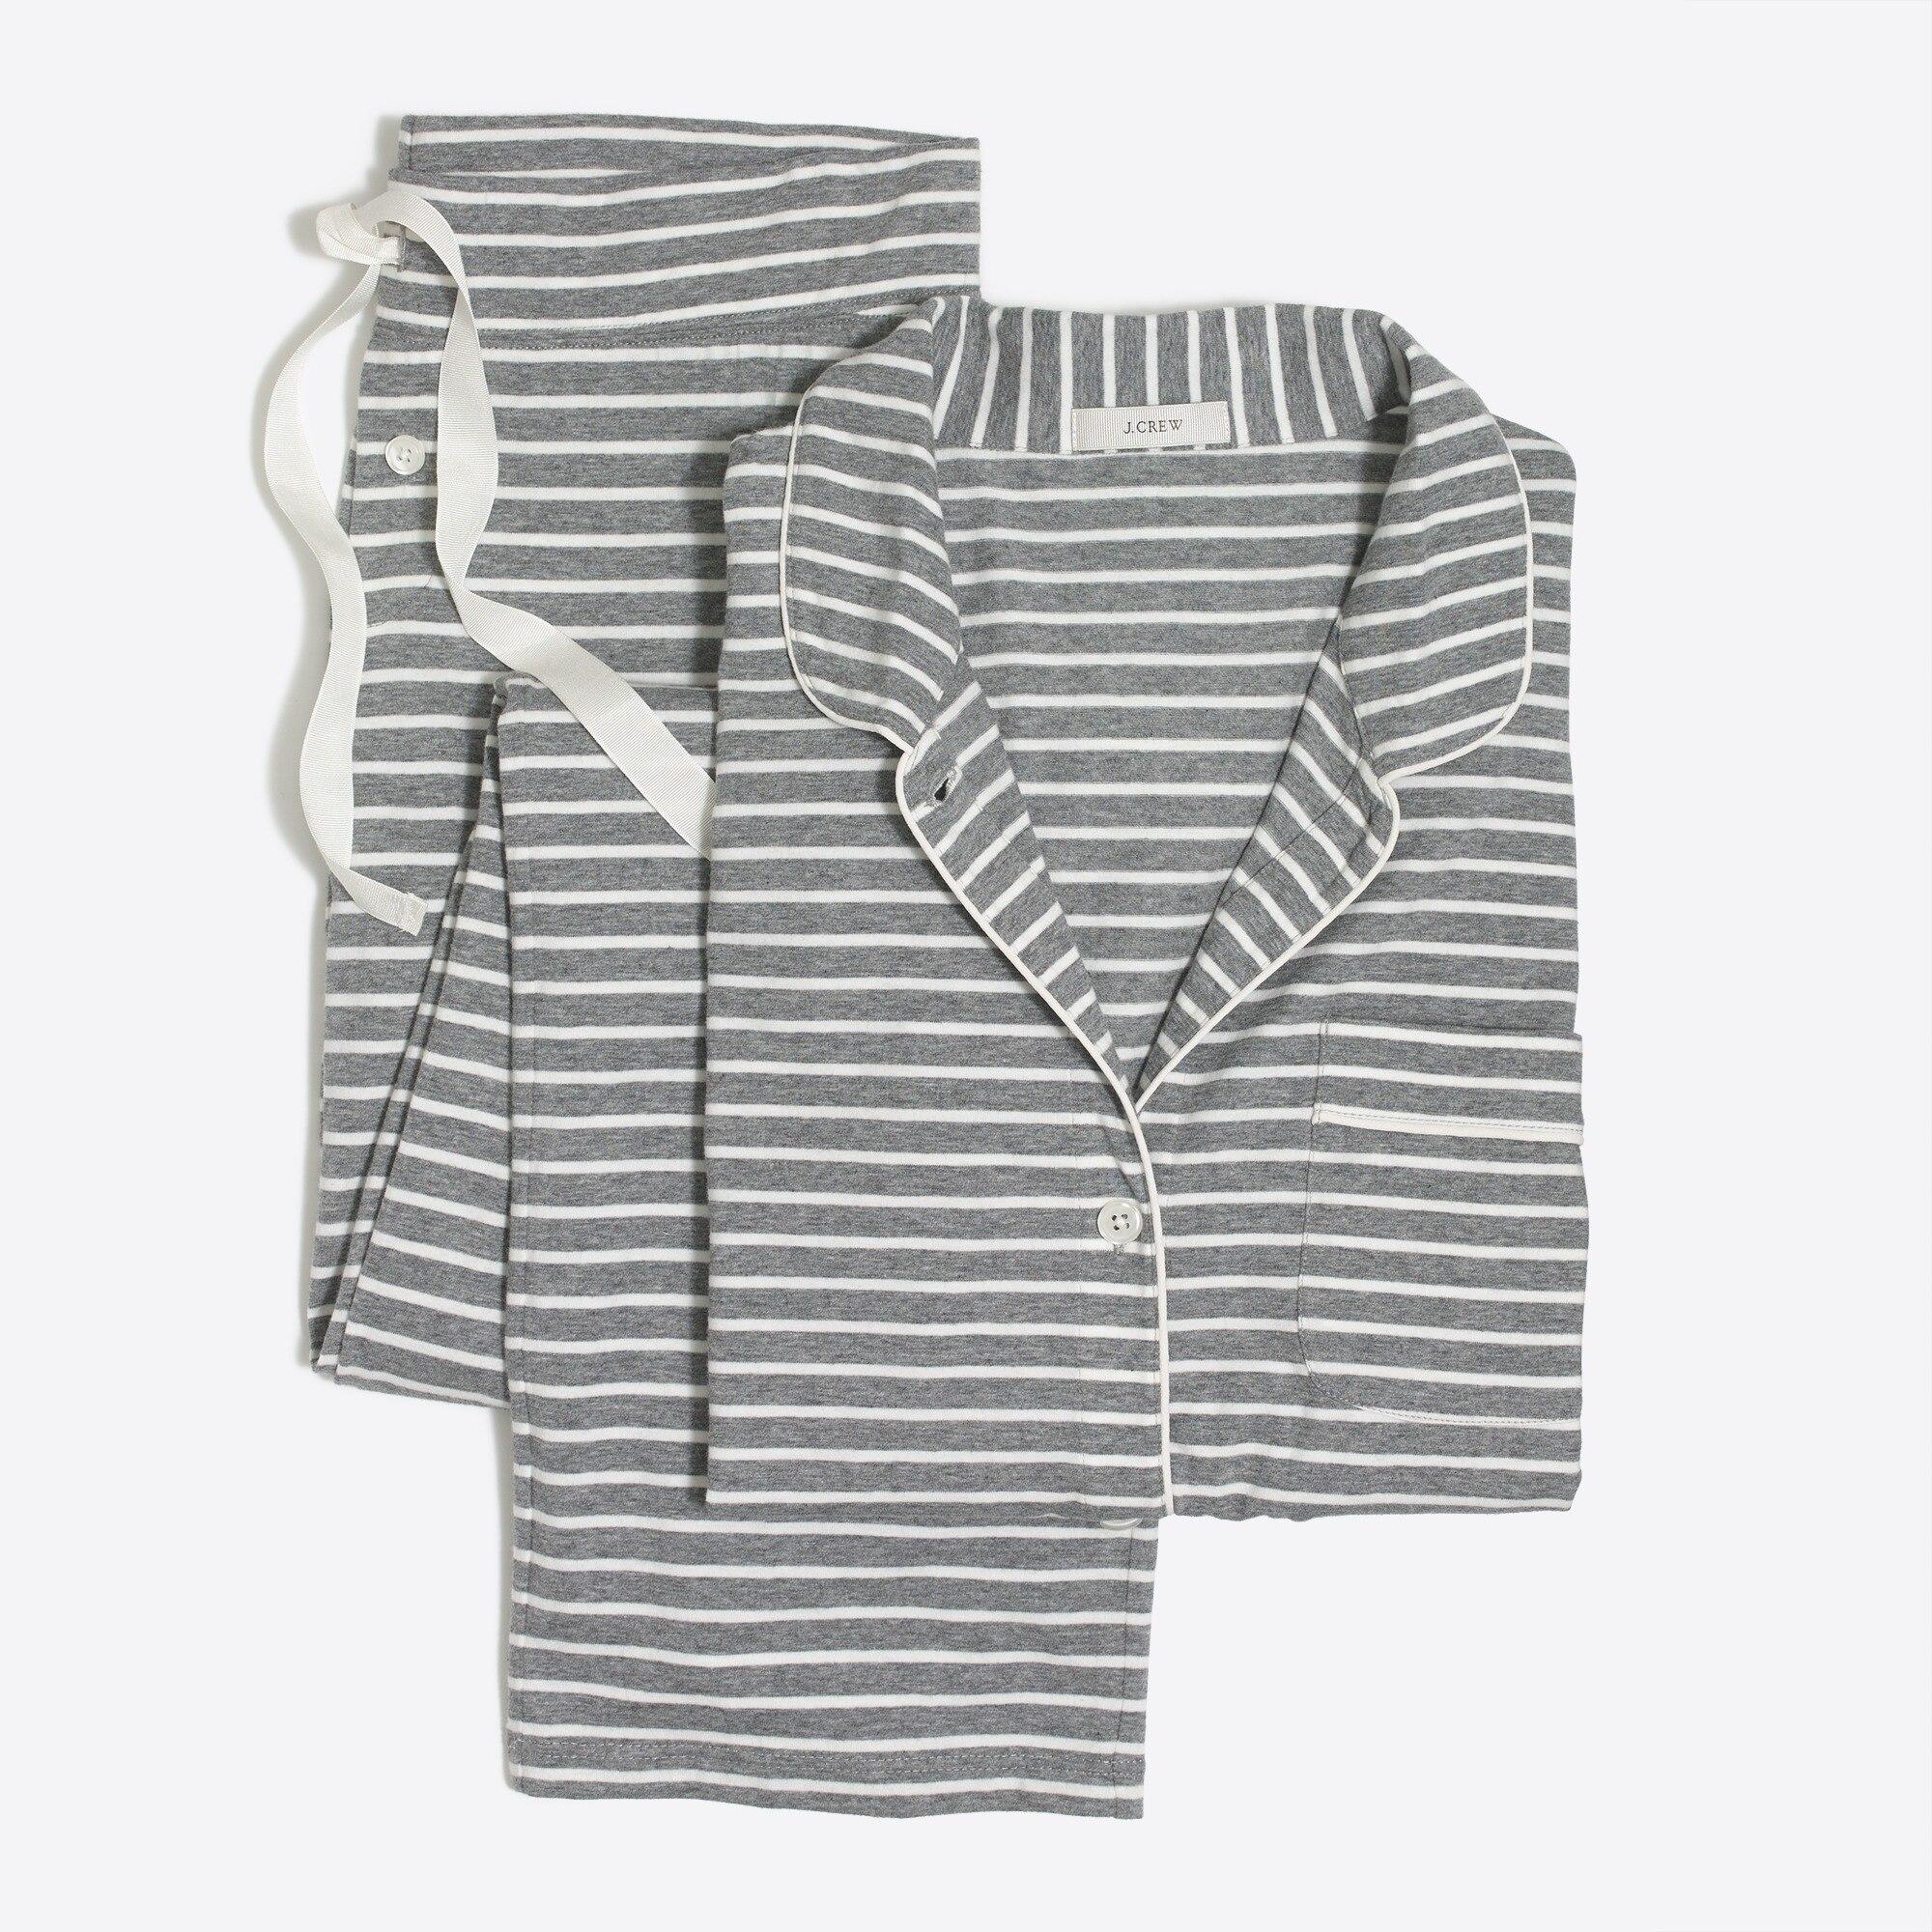 Image 2 for Cotton knit sleep set